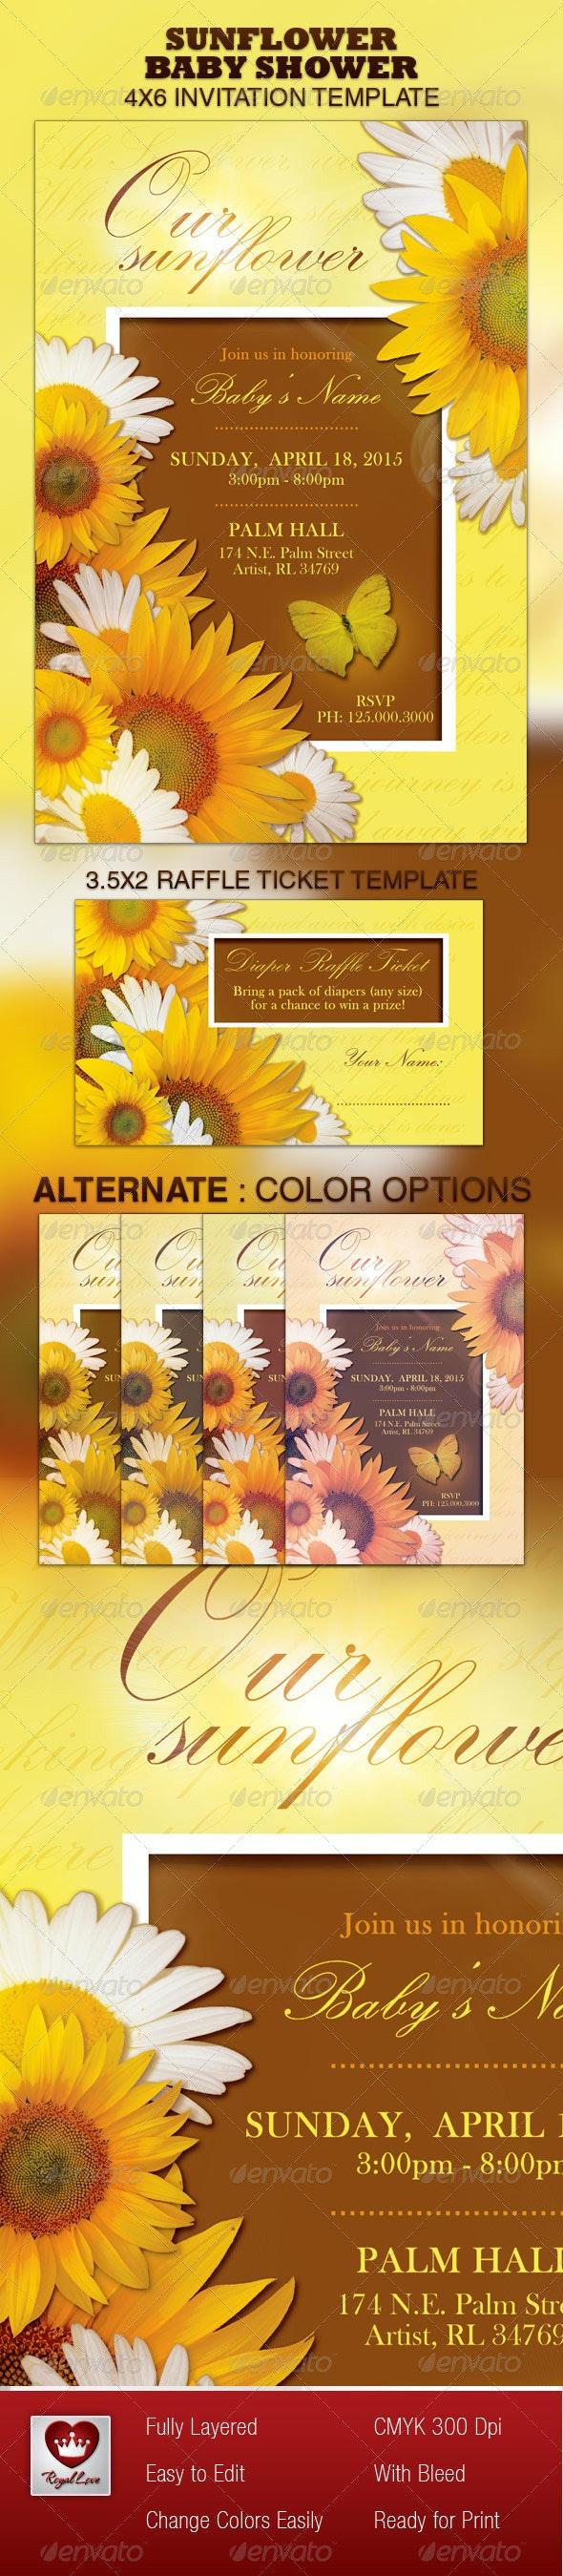 Sunflower Baby Shower Invitation Raffle Ticket By Royallove